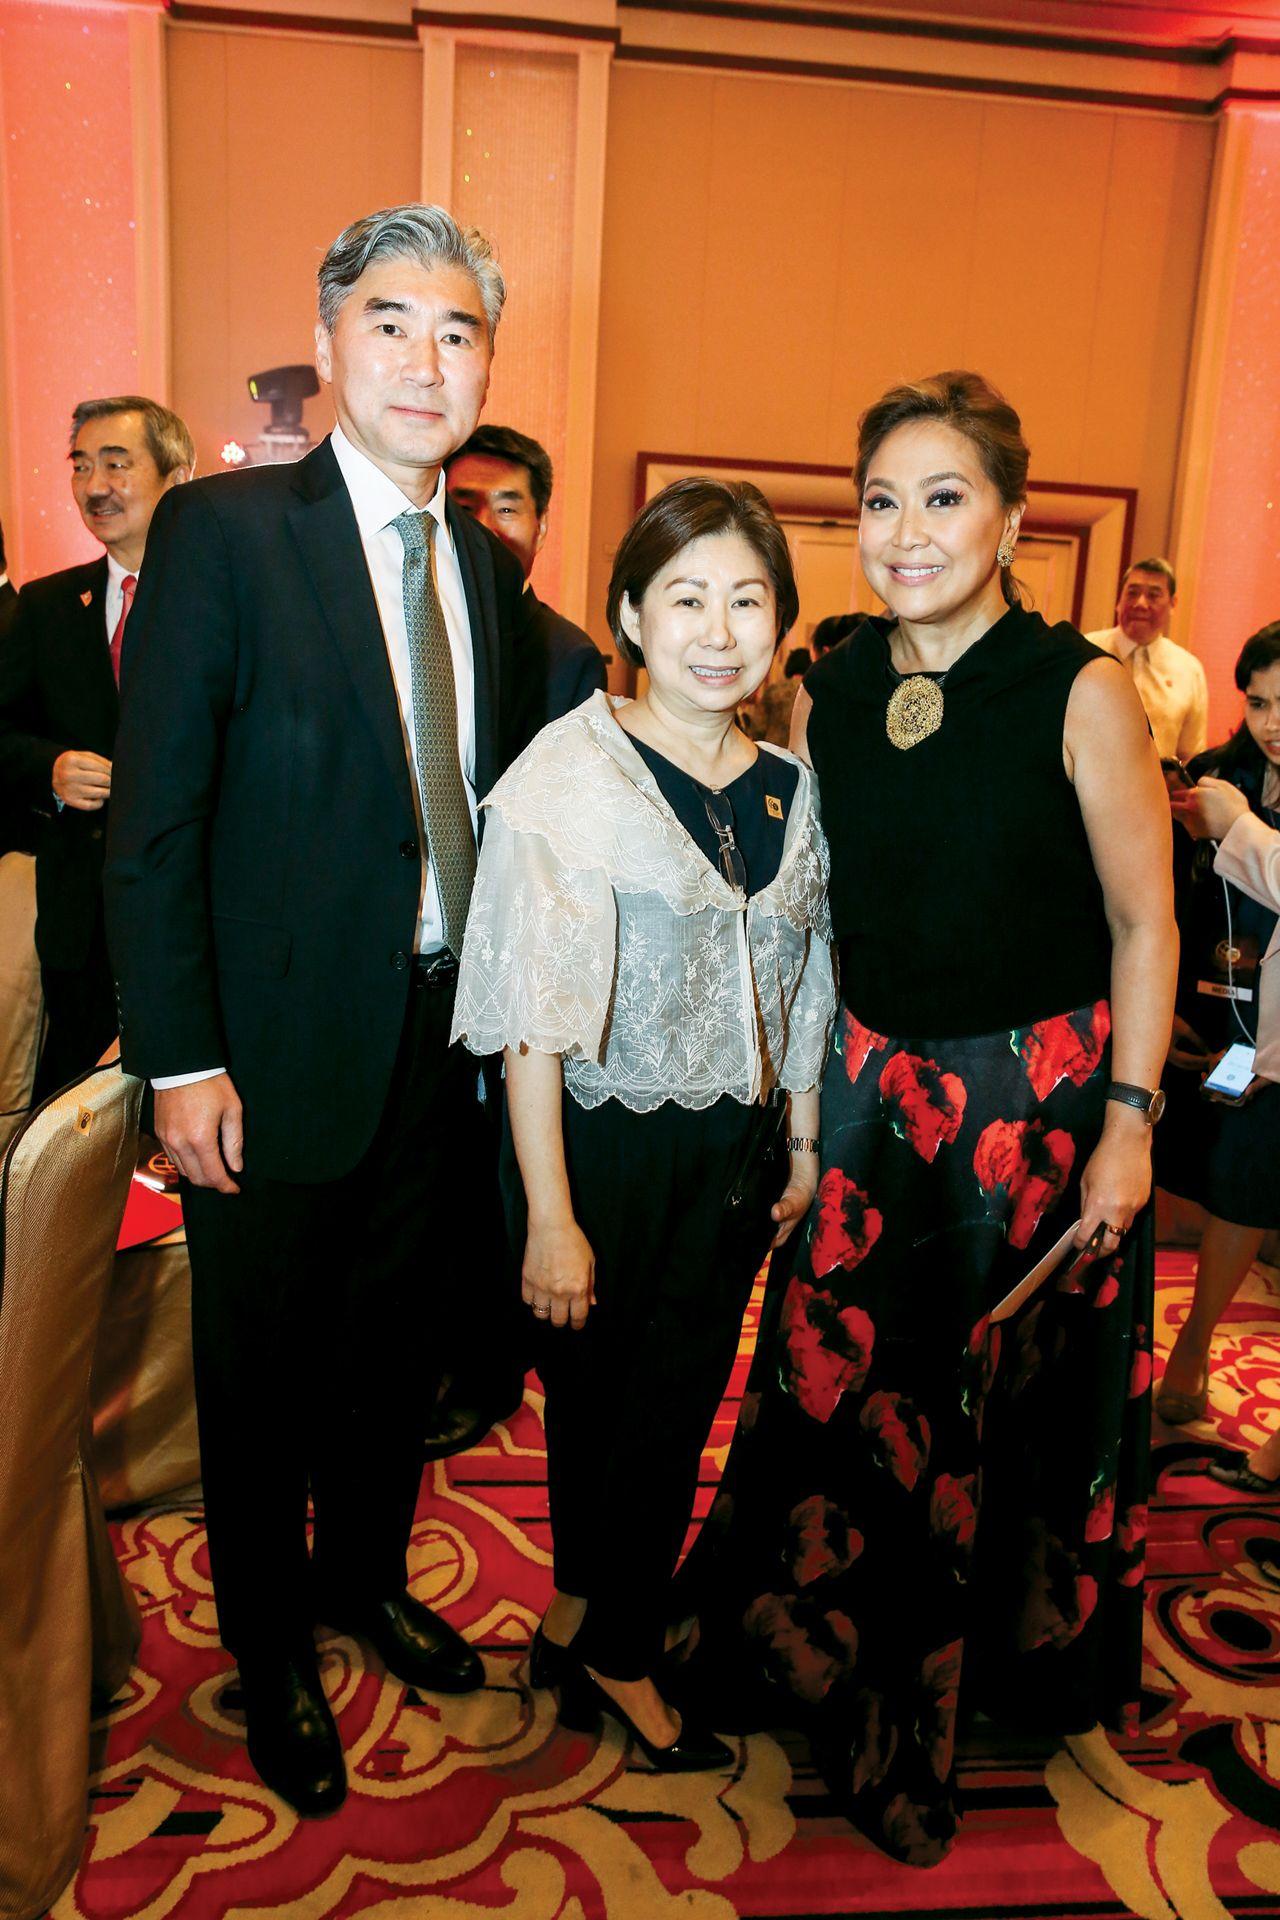 Ambassador Sung Kim,Tessie Sy-Coson, Karen Davila